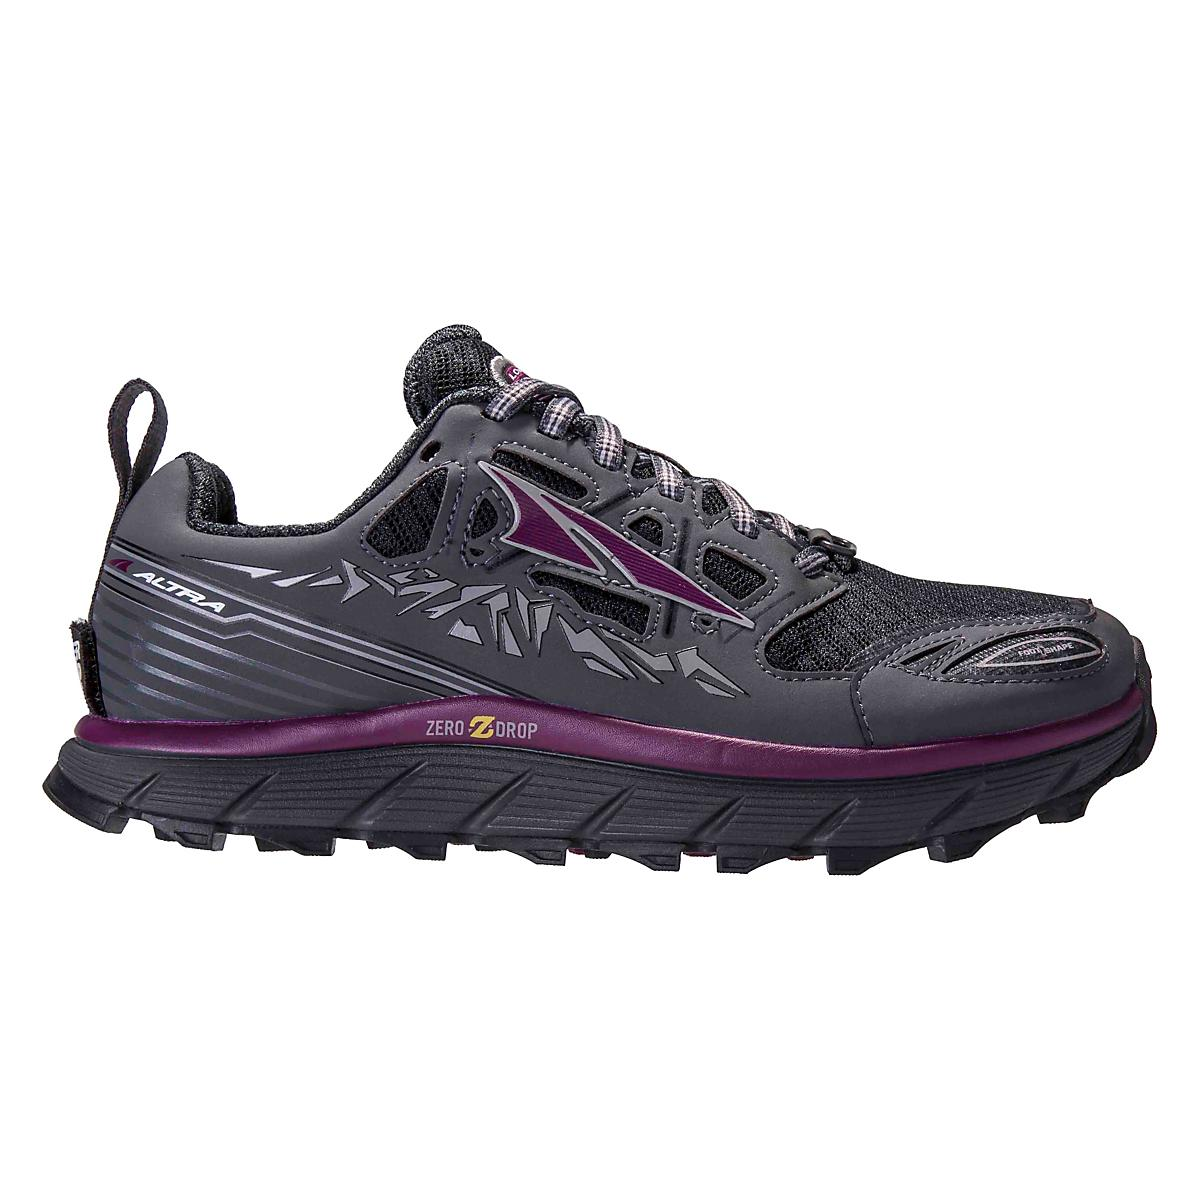 3c6c5dfec Womens Altra Lone Peak 3.0 Trail Running Shoe at Road Runner Sports